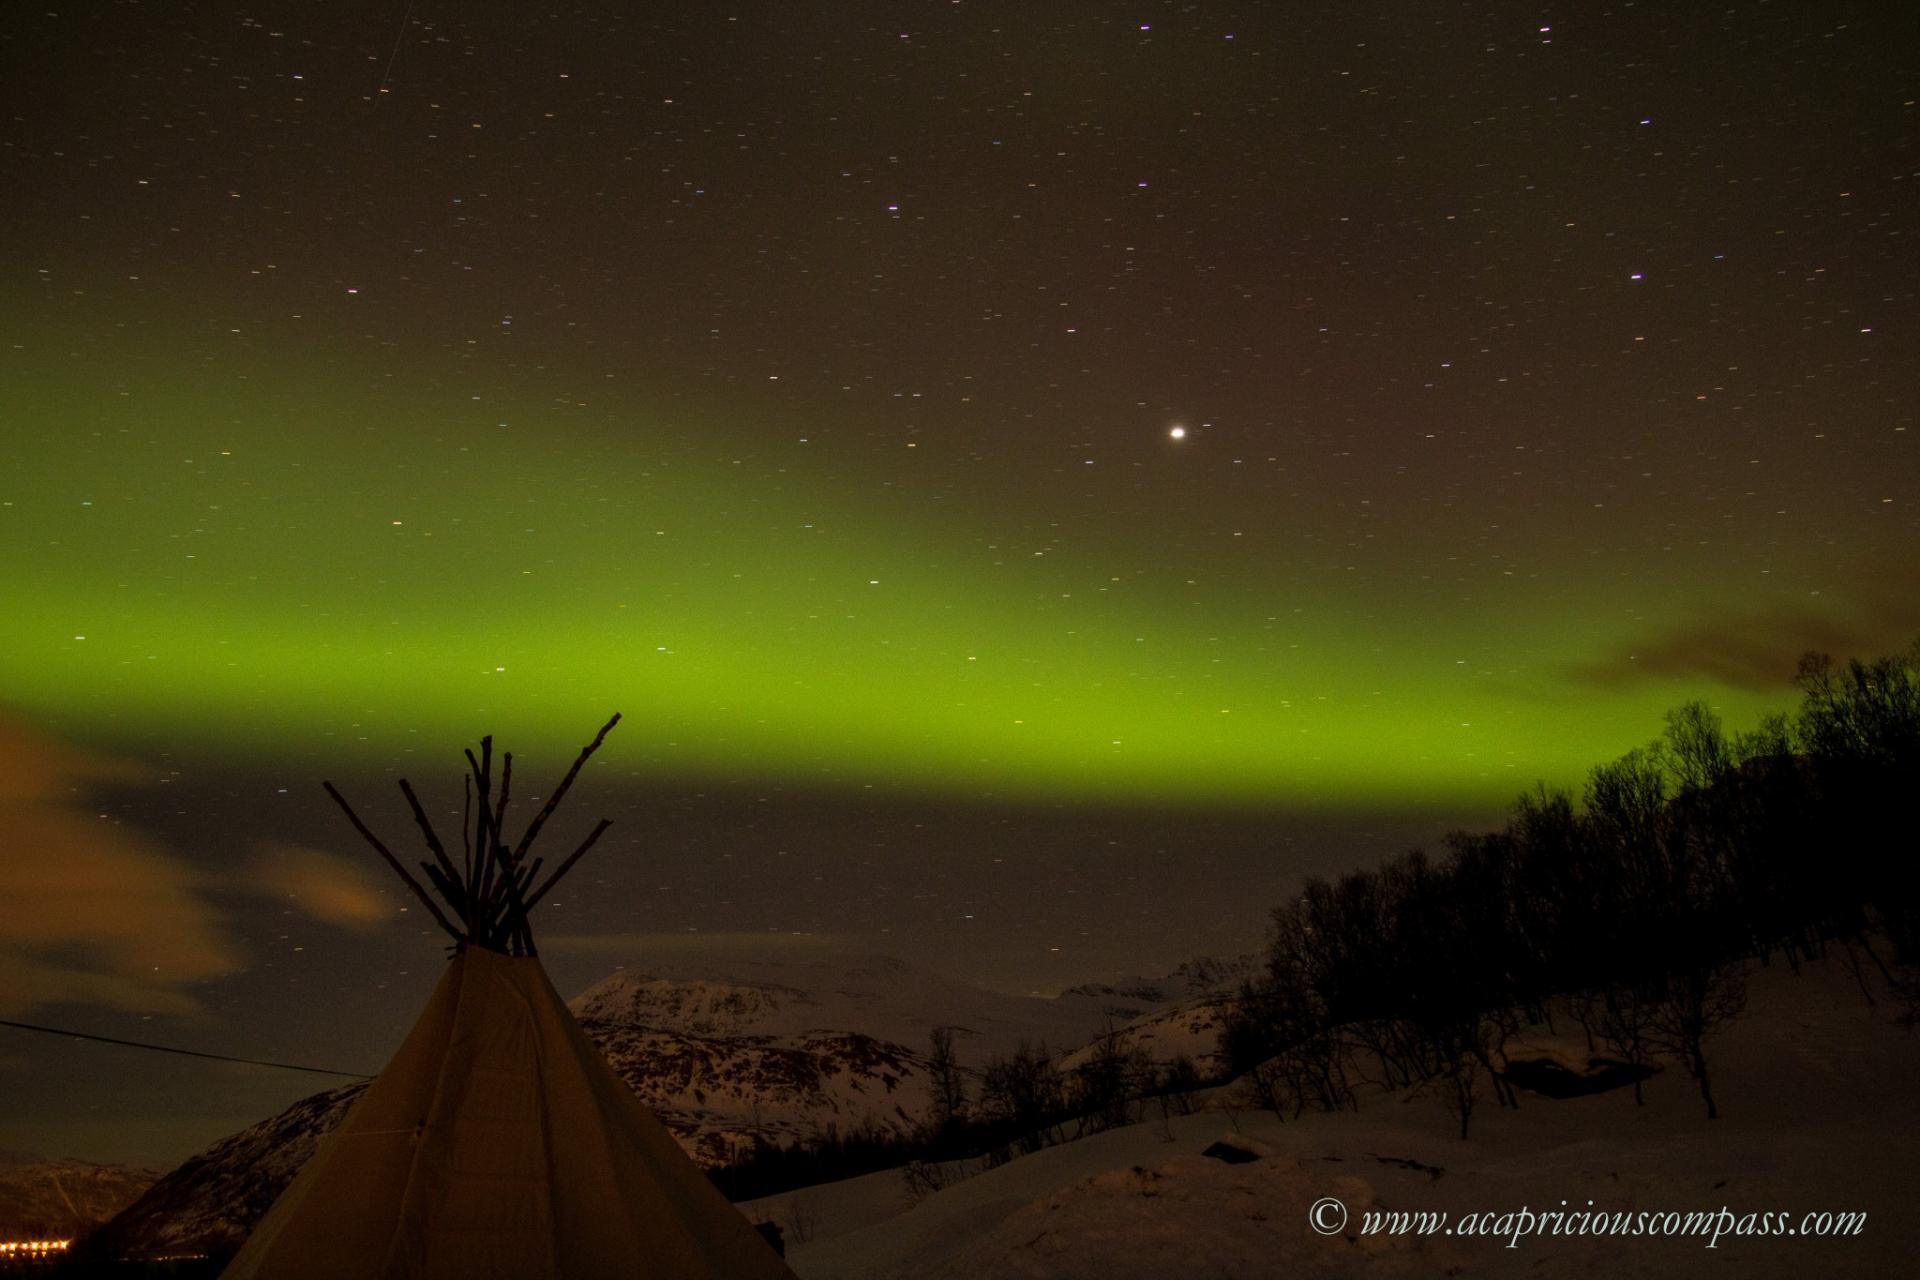 The-Northern-Lights-again.jpg